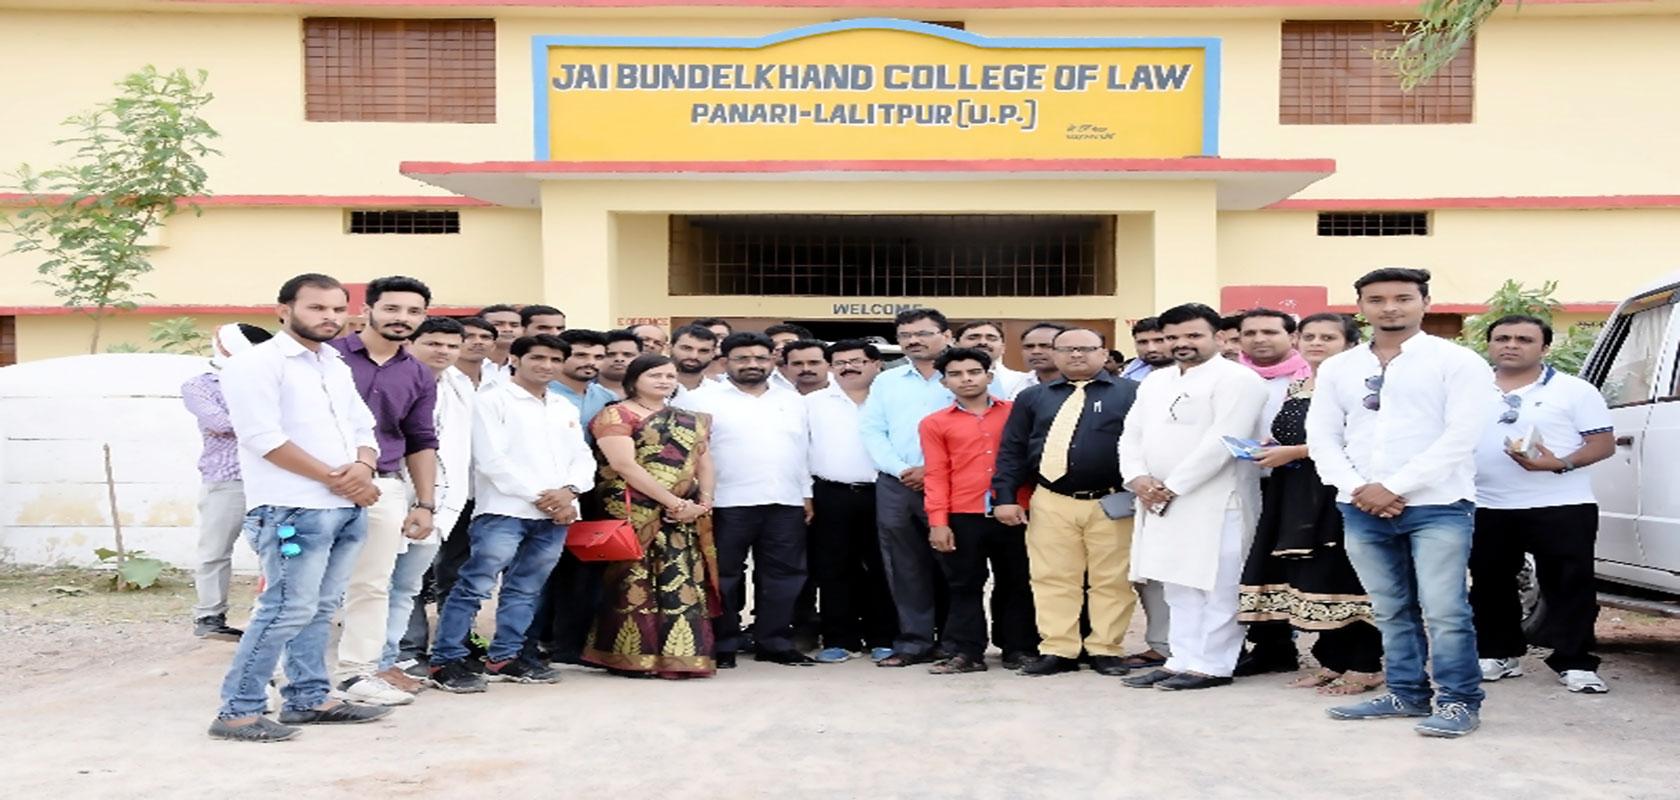 Jai Bundelkhand College of Law, Lalitpur